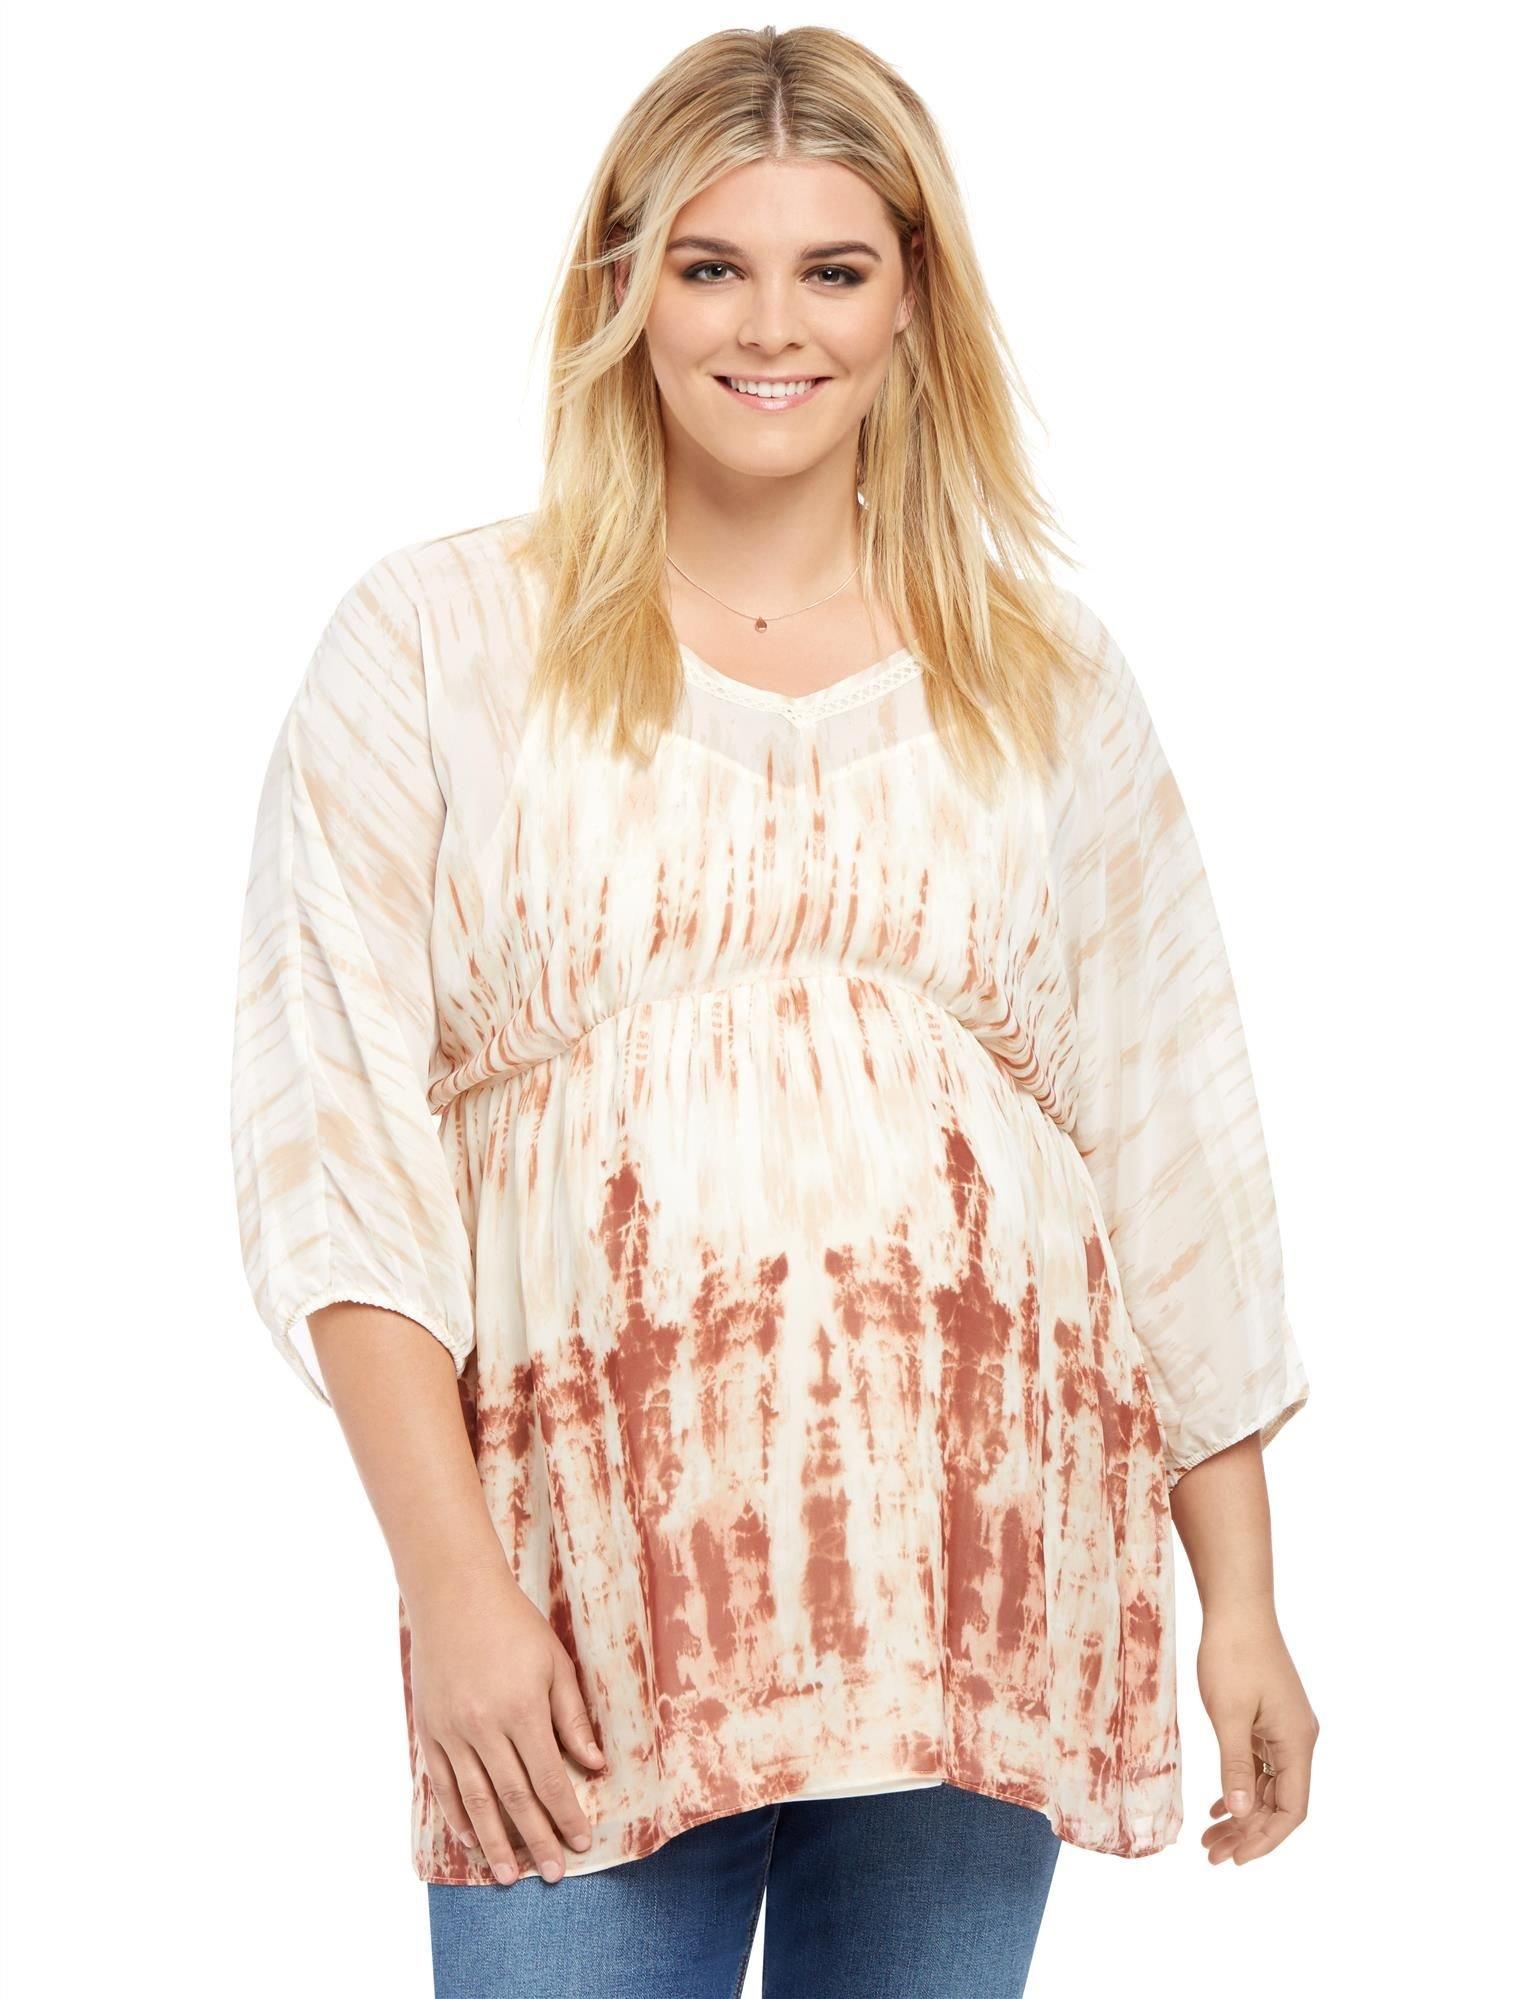 Motherhood Plus Size 3/4 Sleeve Fit And Flare Maternity Blouse,Tye Dye,2X